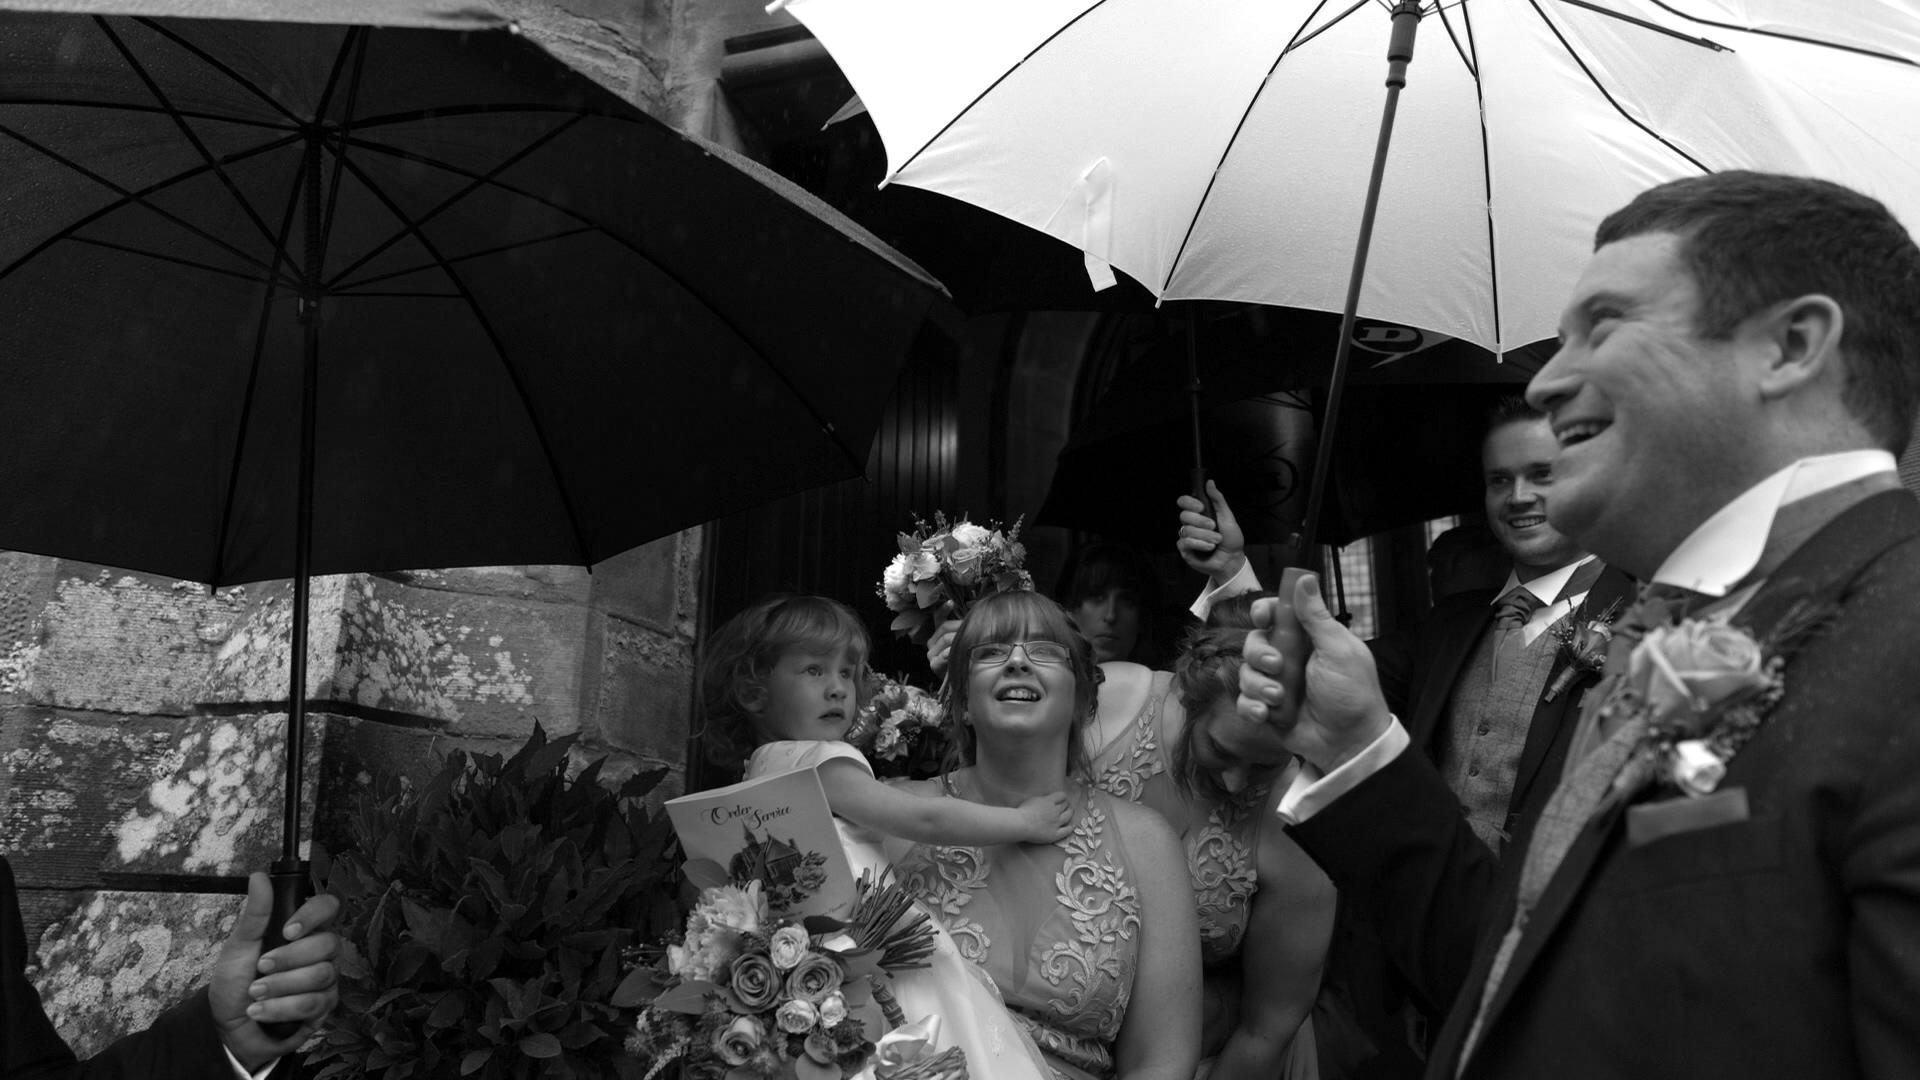 DRUMTOCHTY-SUMMER-WEDDING (14).jpg